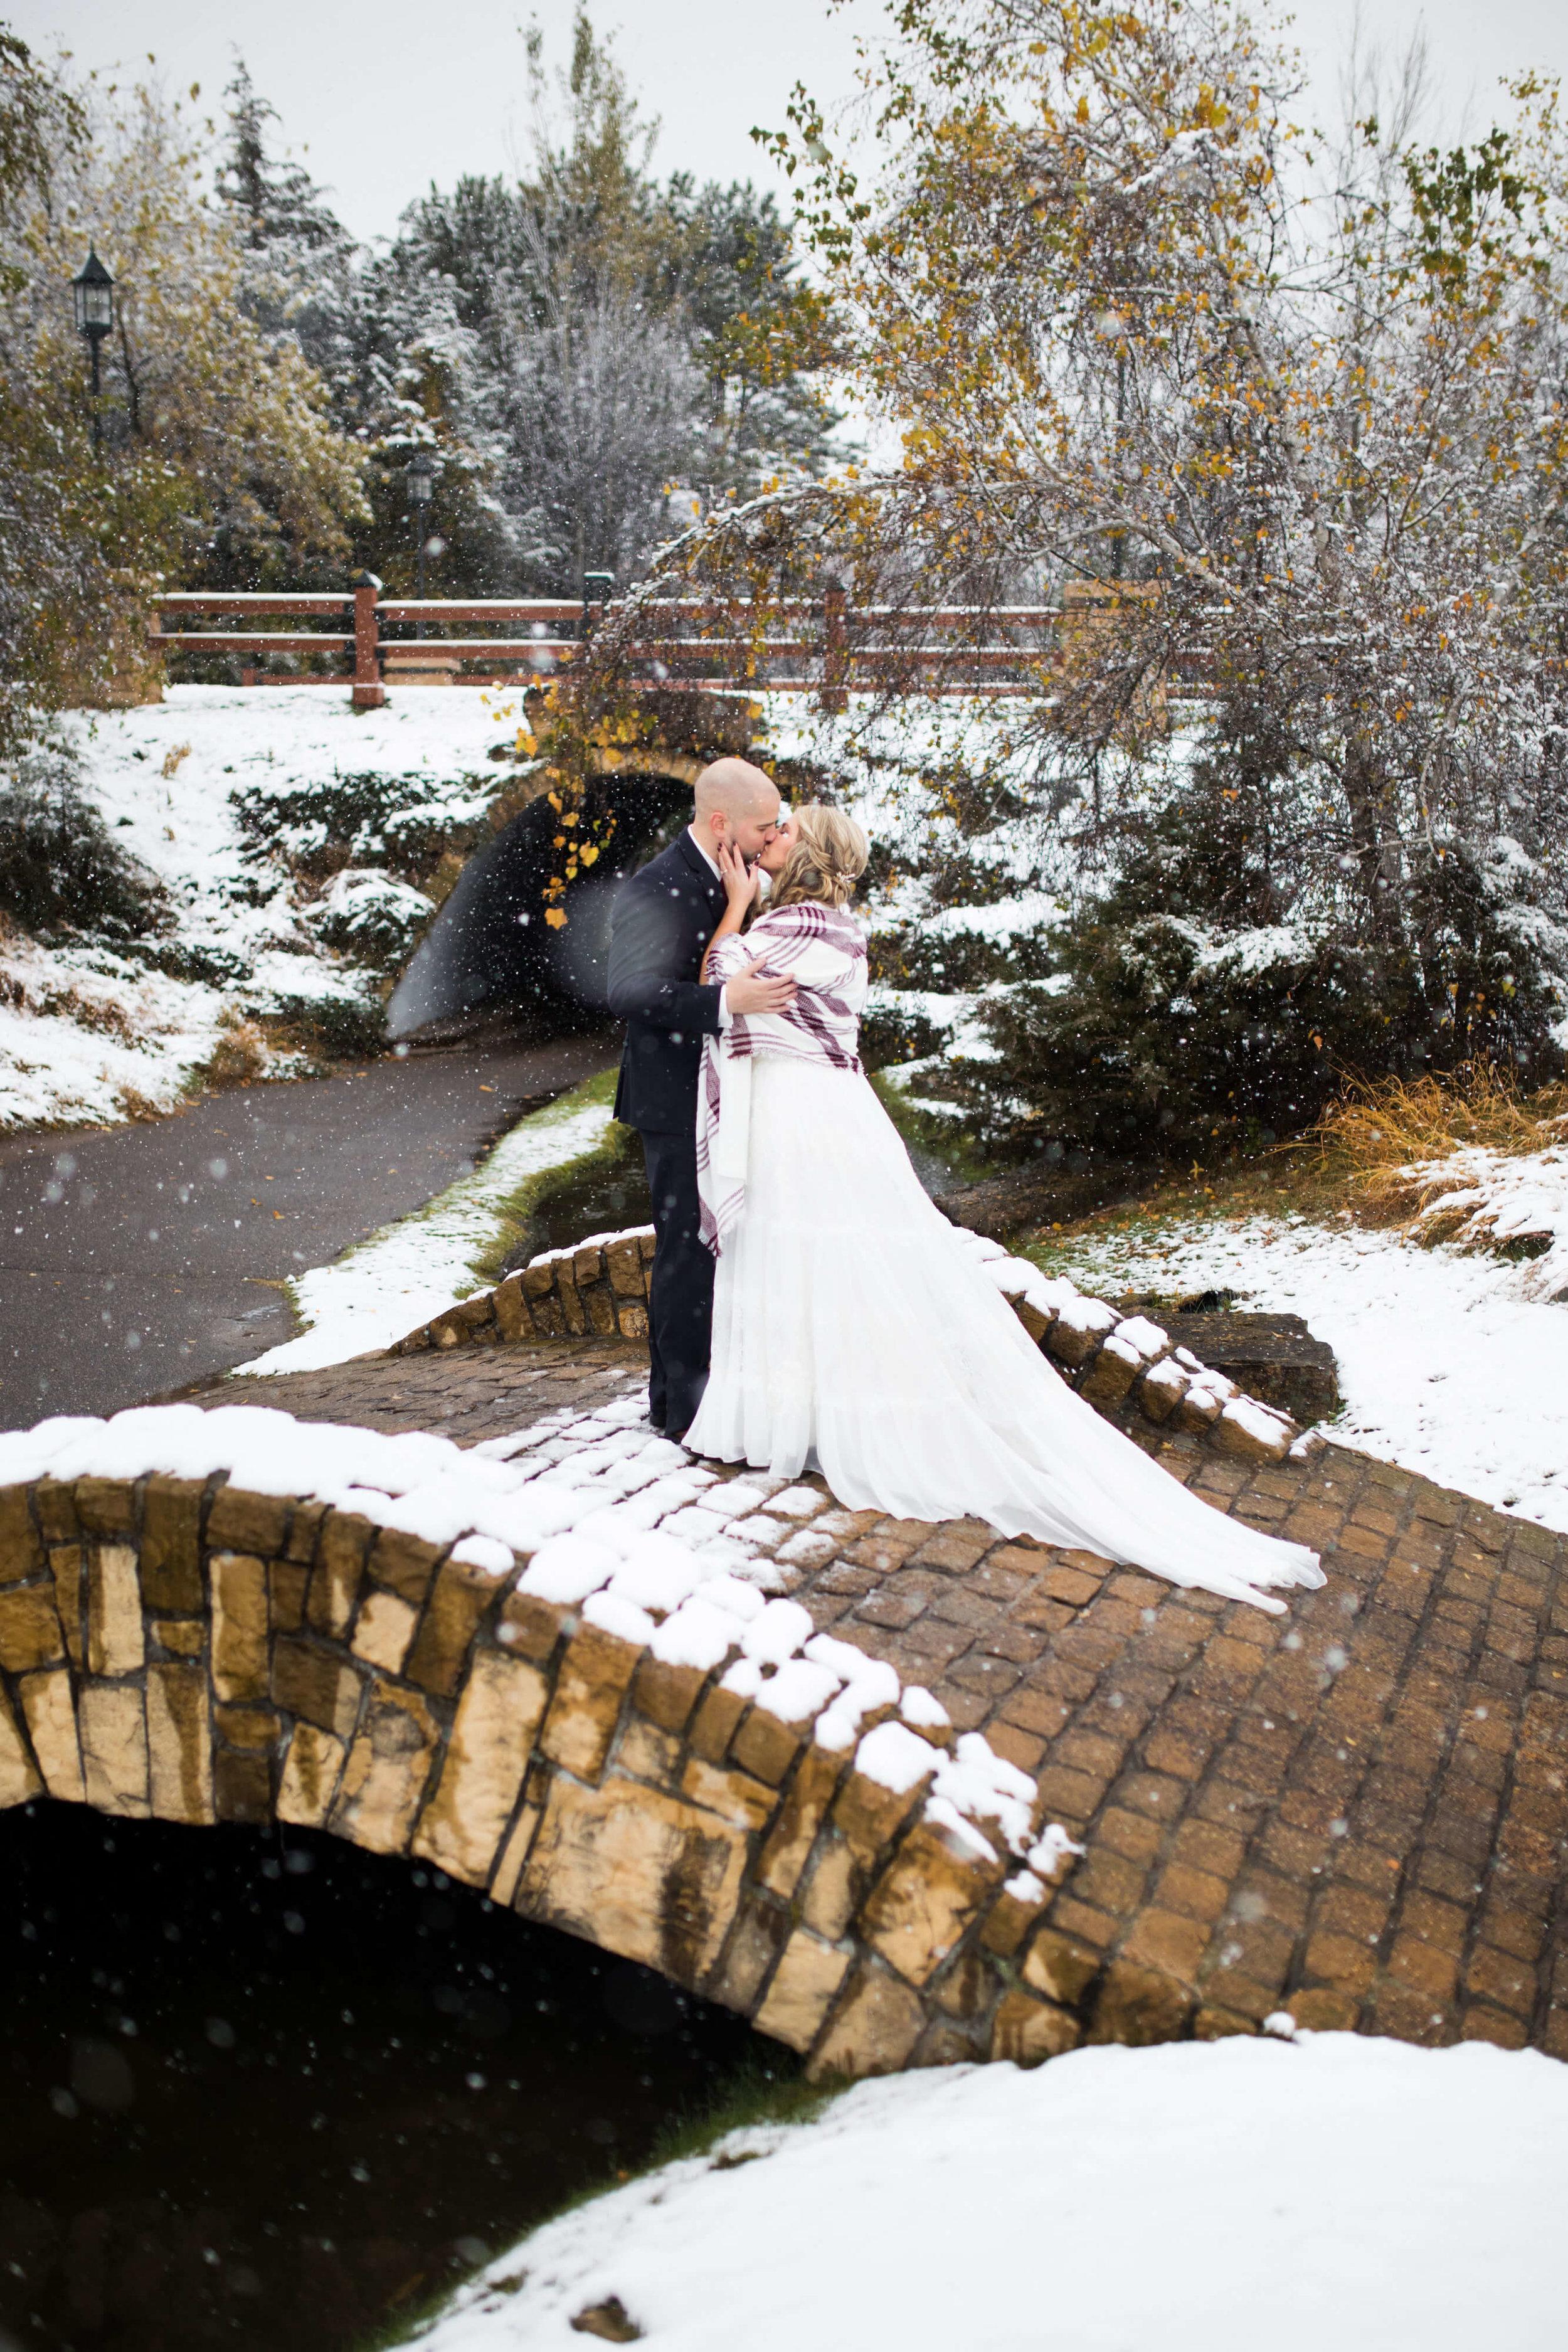 winter wedding | plaid shawl | bridge with snow | Minnesota wedding photographer Studio KH wedding dress details | wedding blog | Sixpence Events 70 Ways to Photograph Your Wedding Dress.jpg